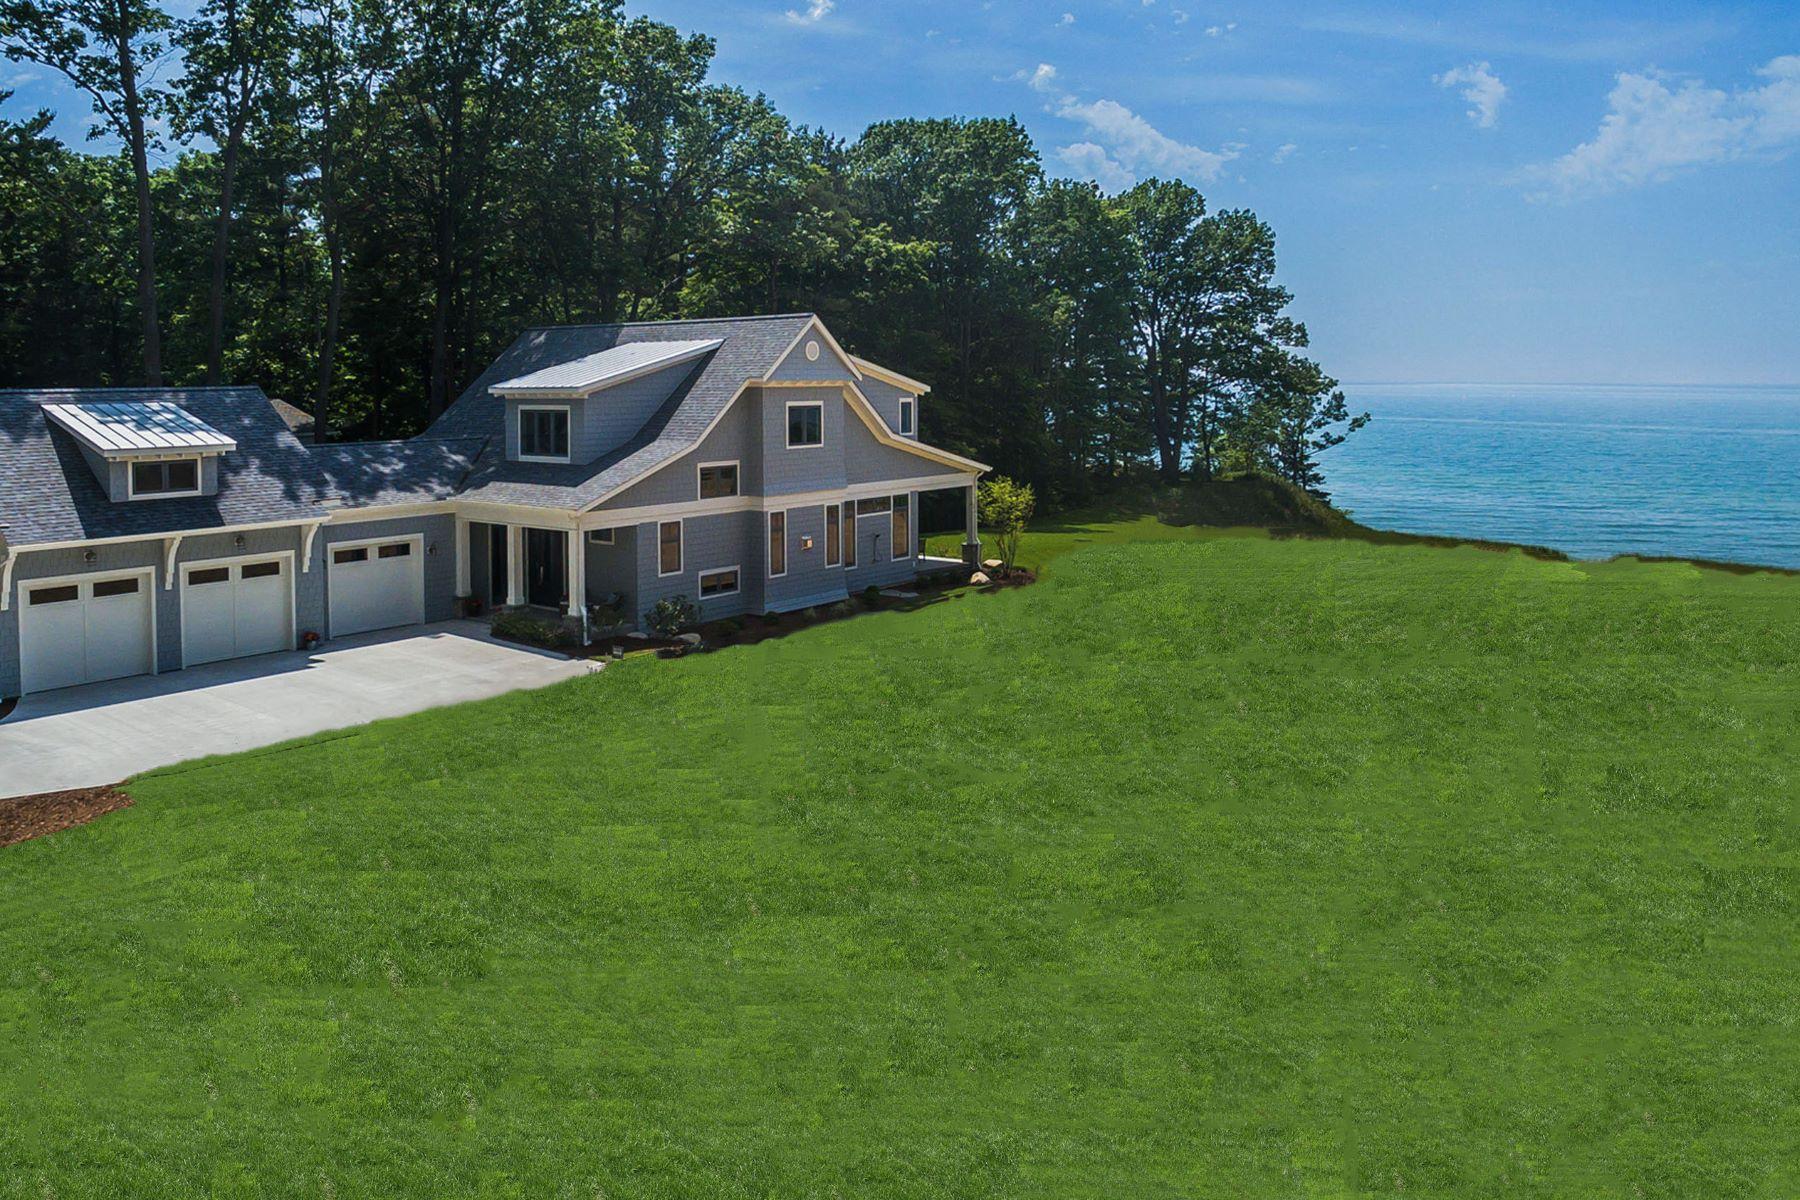 其他住宅 為 出售 在 Coastal Elegance On The Shore Of Lake Michigan 77277 South Beach Drive South Haven, 密歇根州, 49090 美國